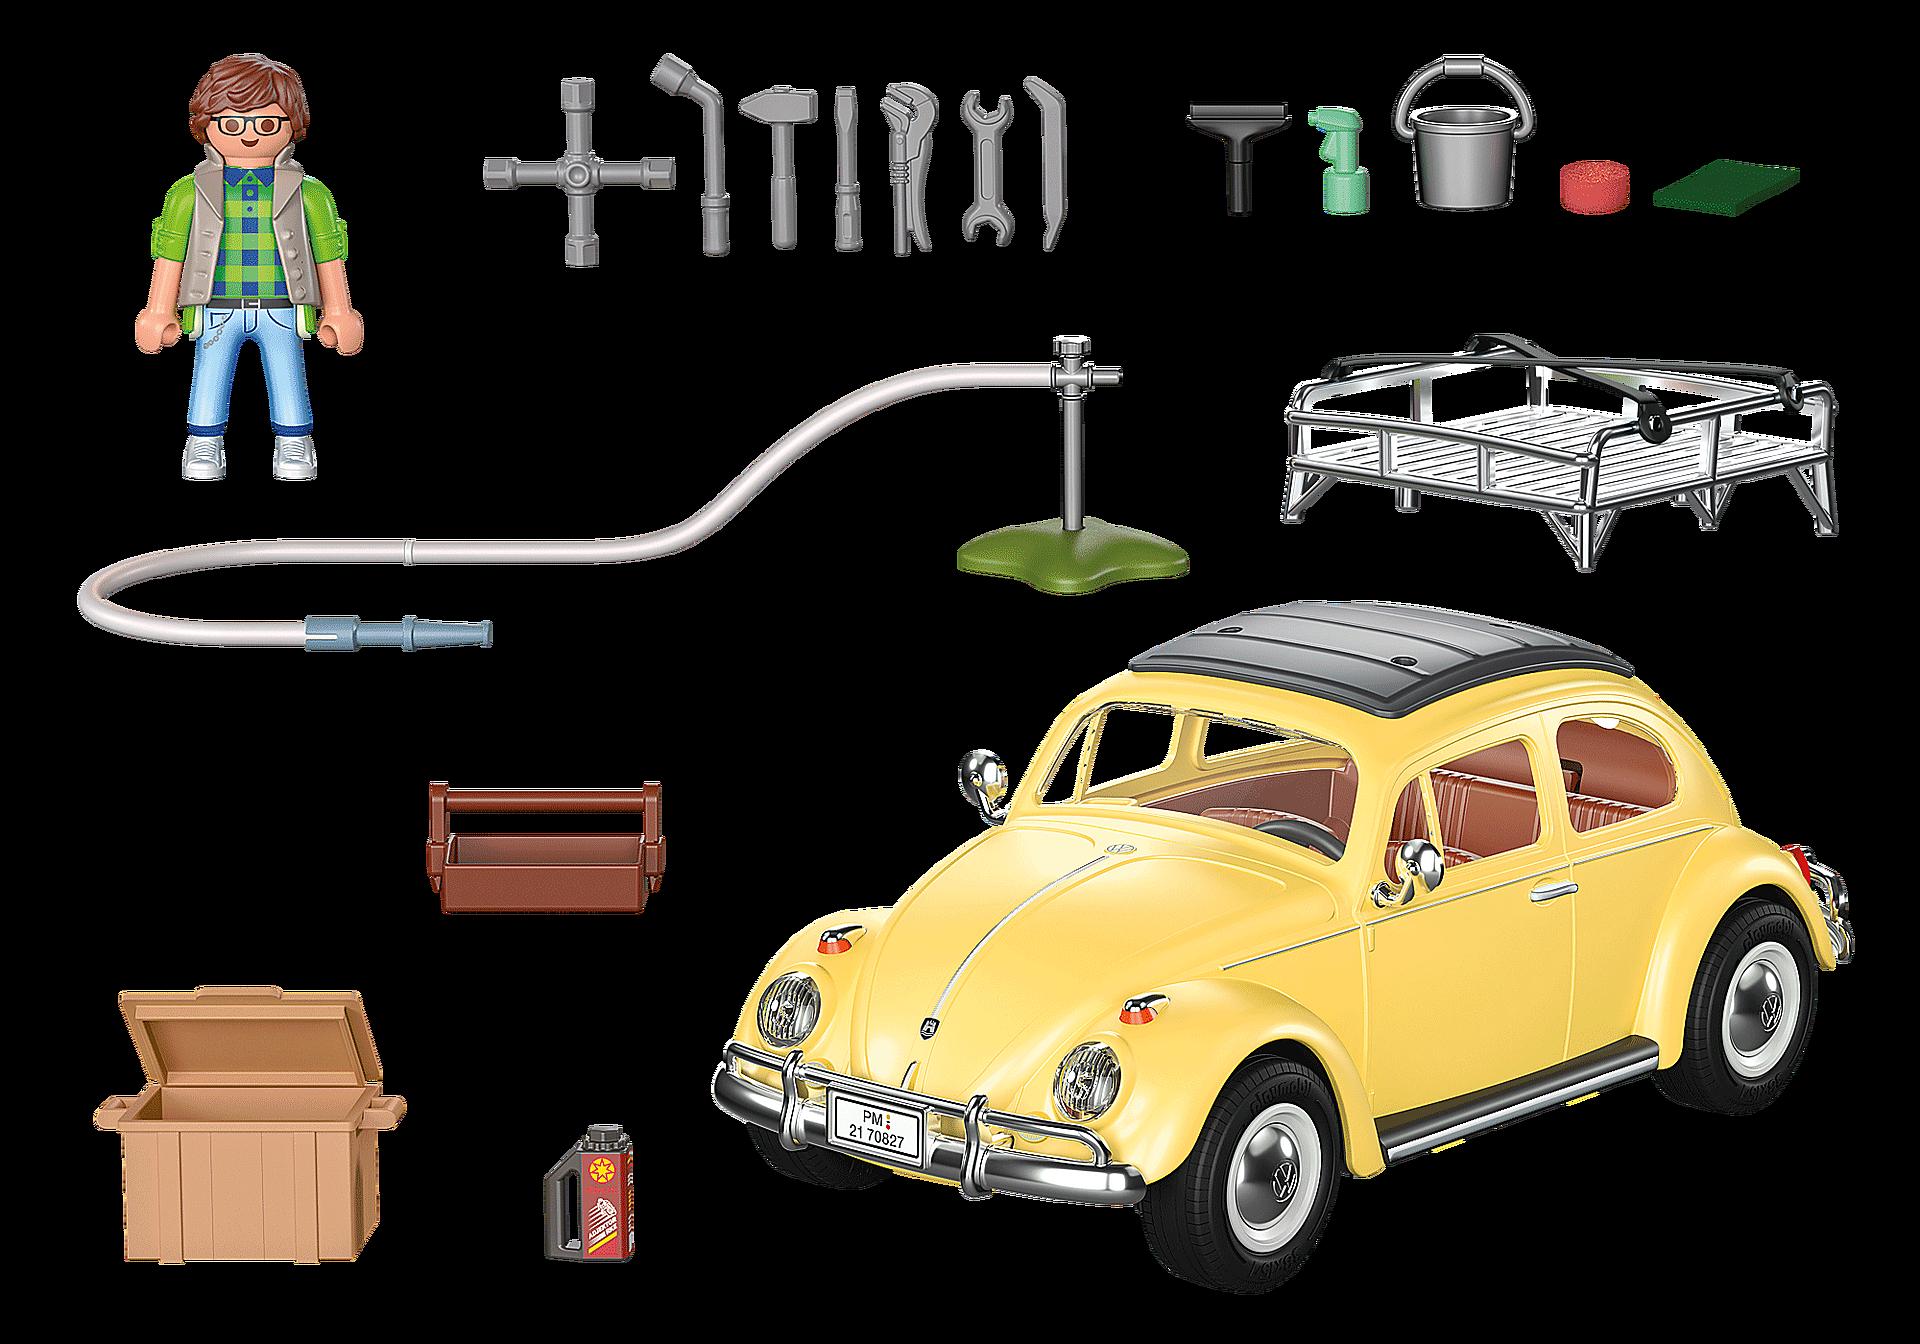 70827 Volkswagen Beetle - Edição especial zoom image3